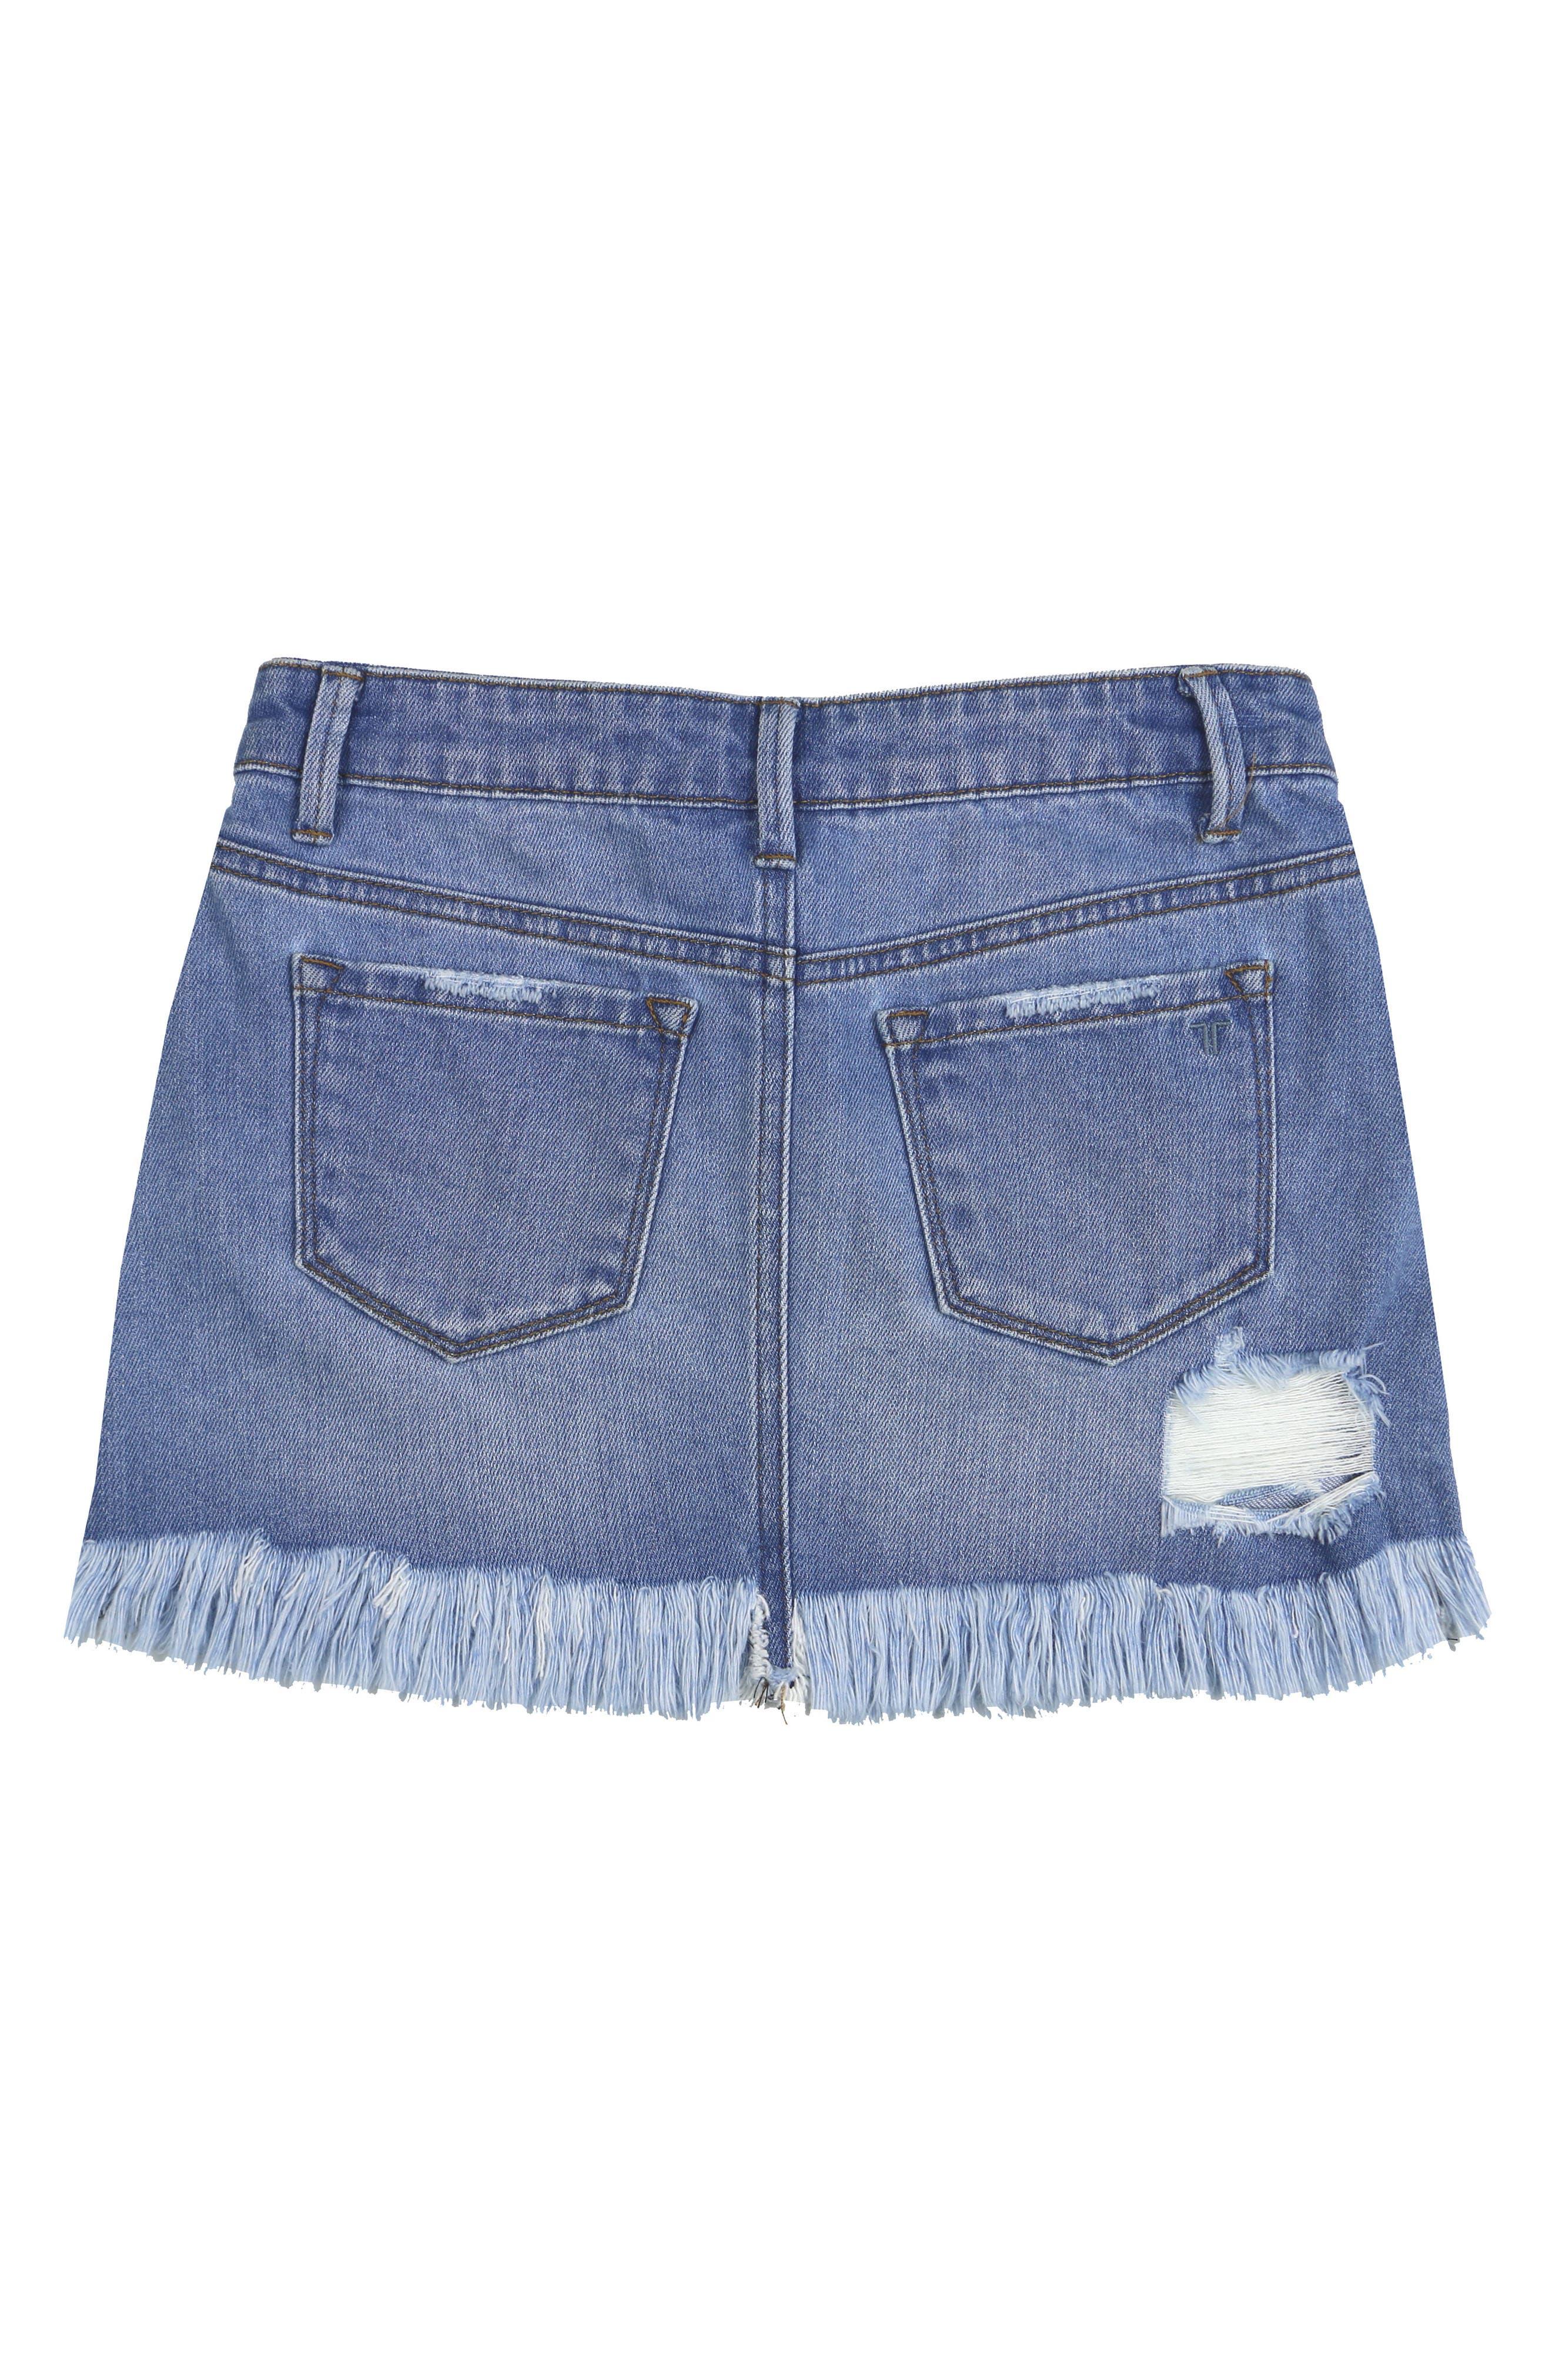 Distressed Denim Skirt,                             Alternate thumbnail 2, color,                             409